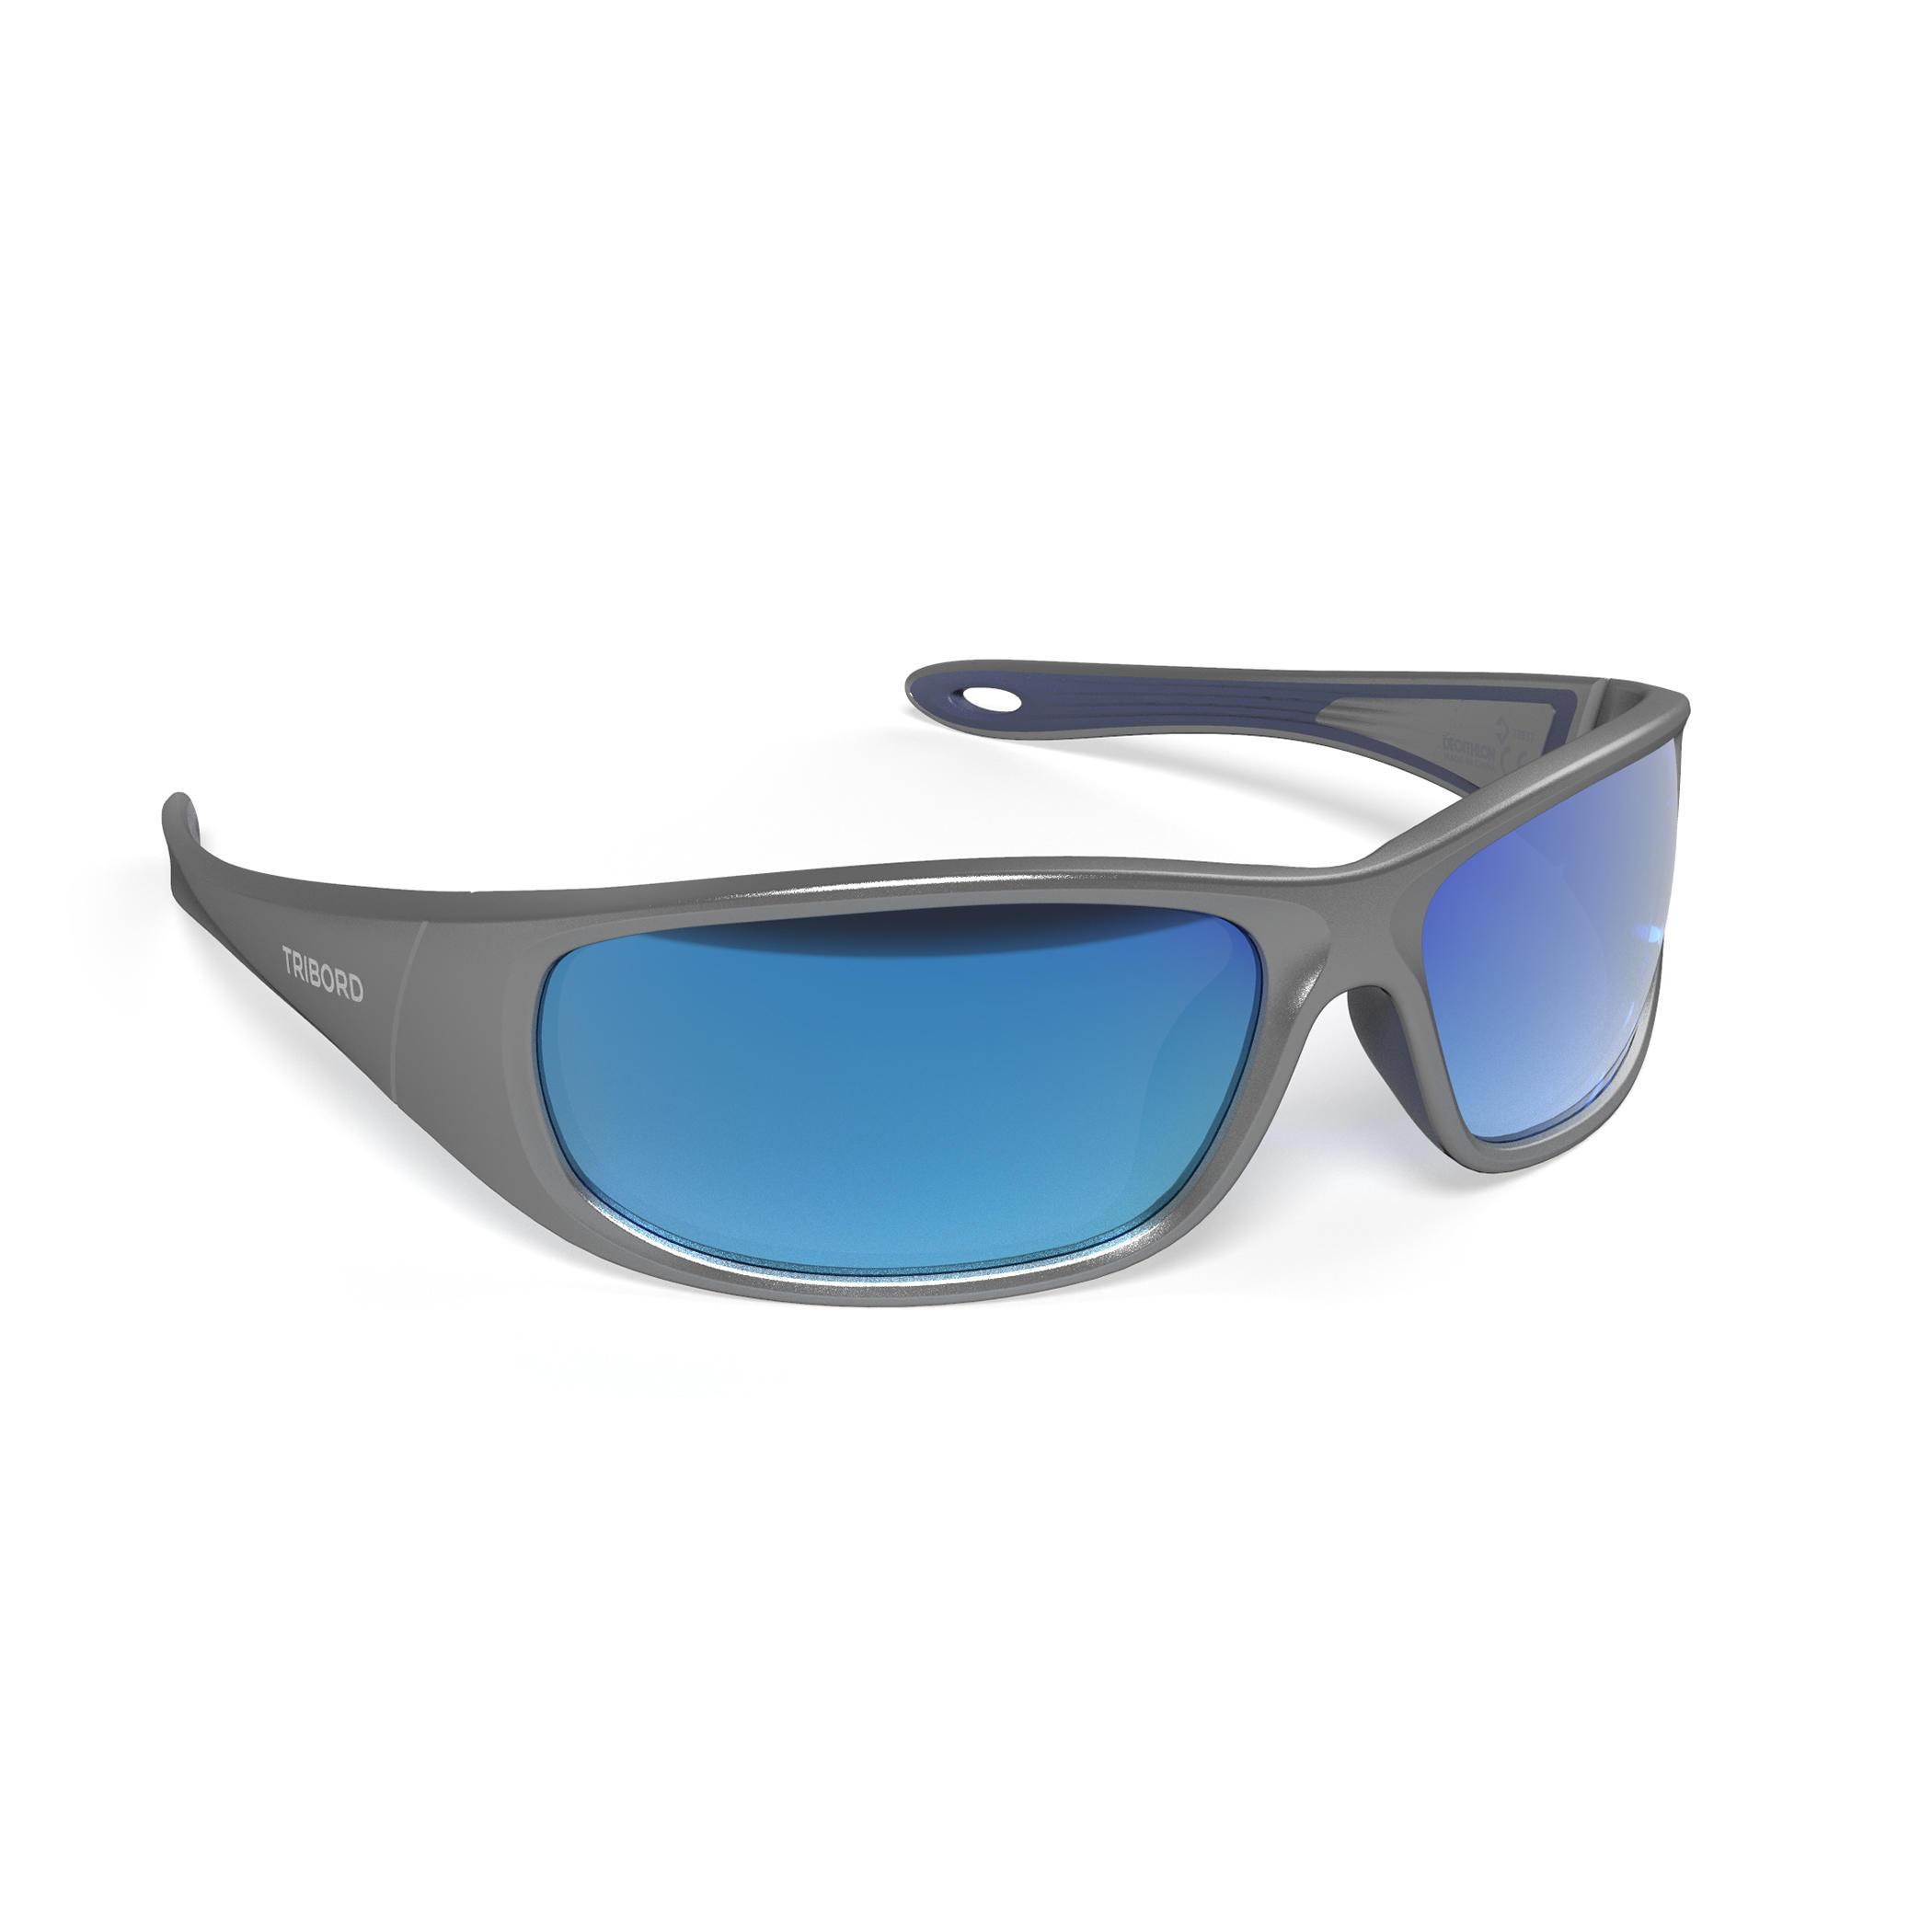 ad42a5488994f Comprar Gafas de Sol Polarizadas online